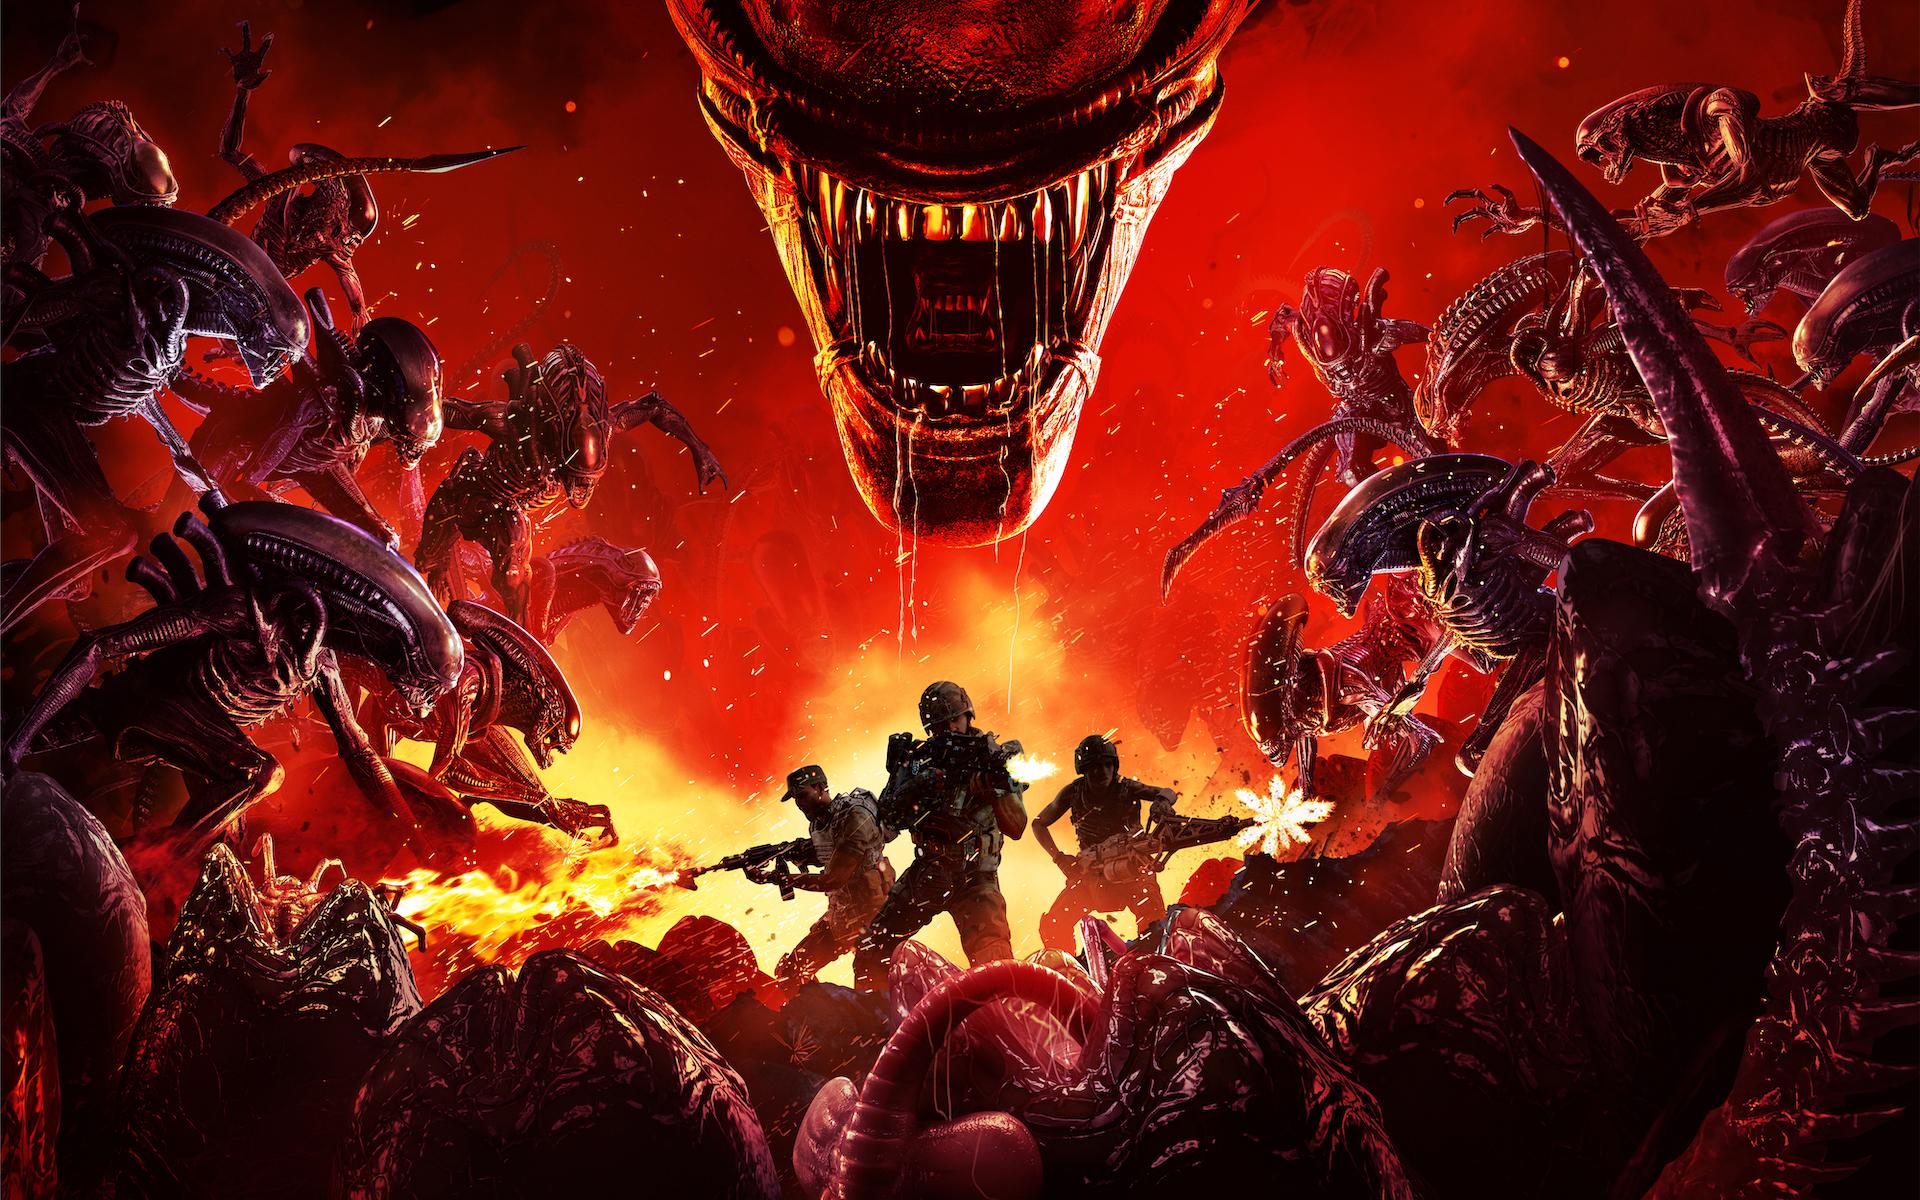 Key art for Aliens: Fireteam Elite, featuring three Marines taking on a swarm of Xenomorphs